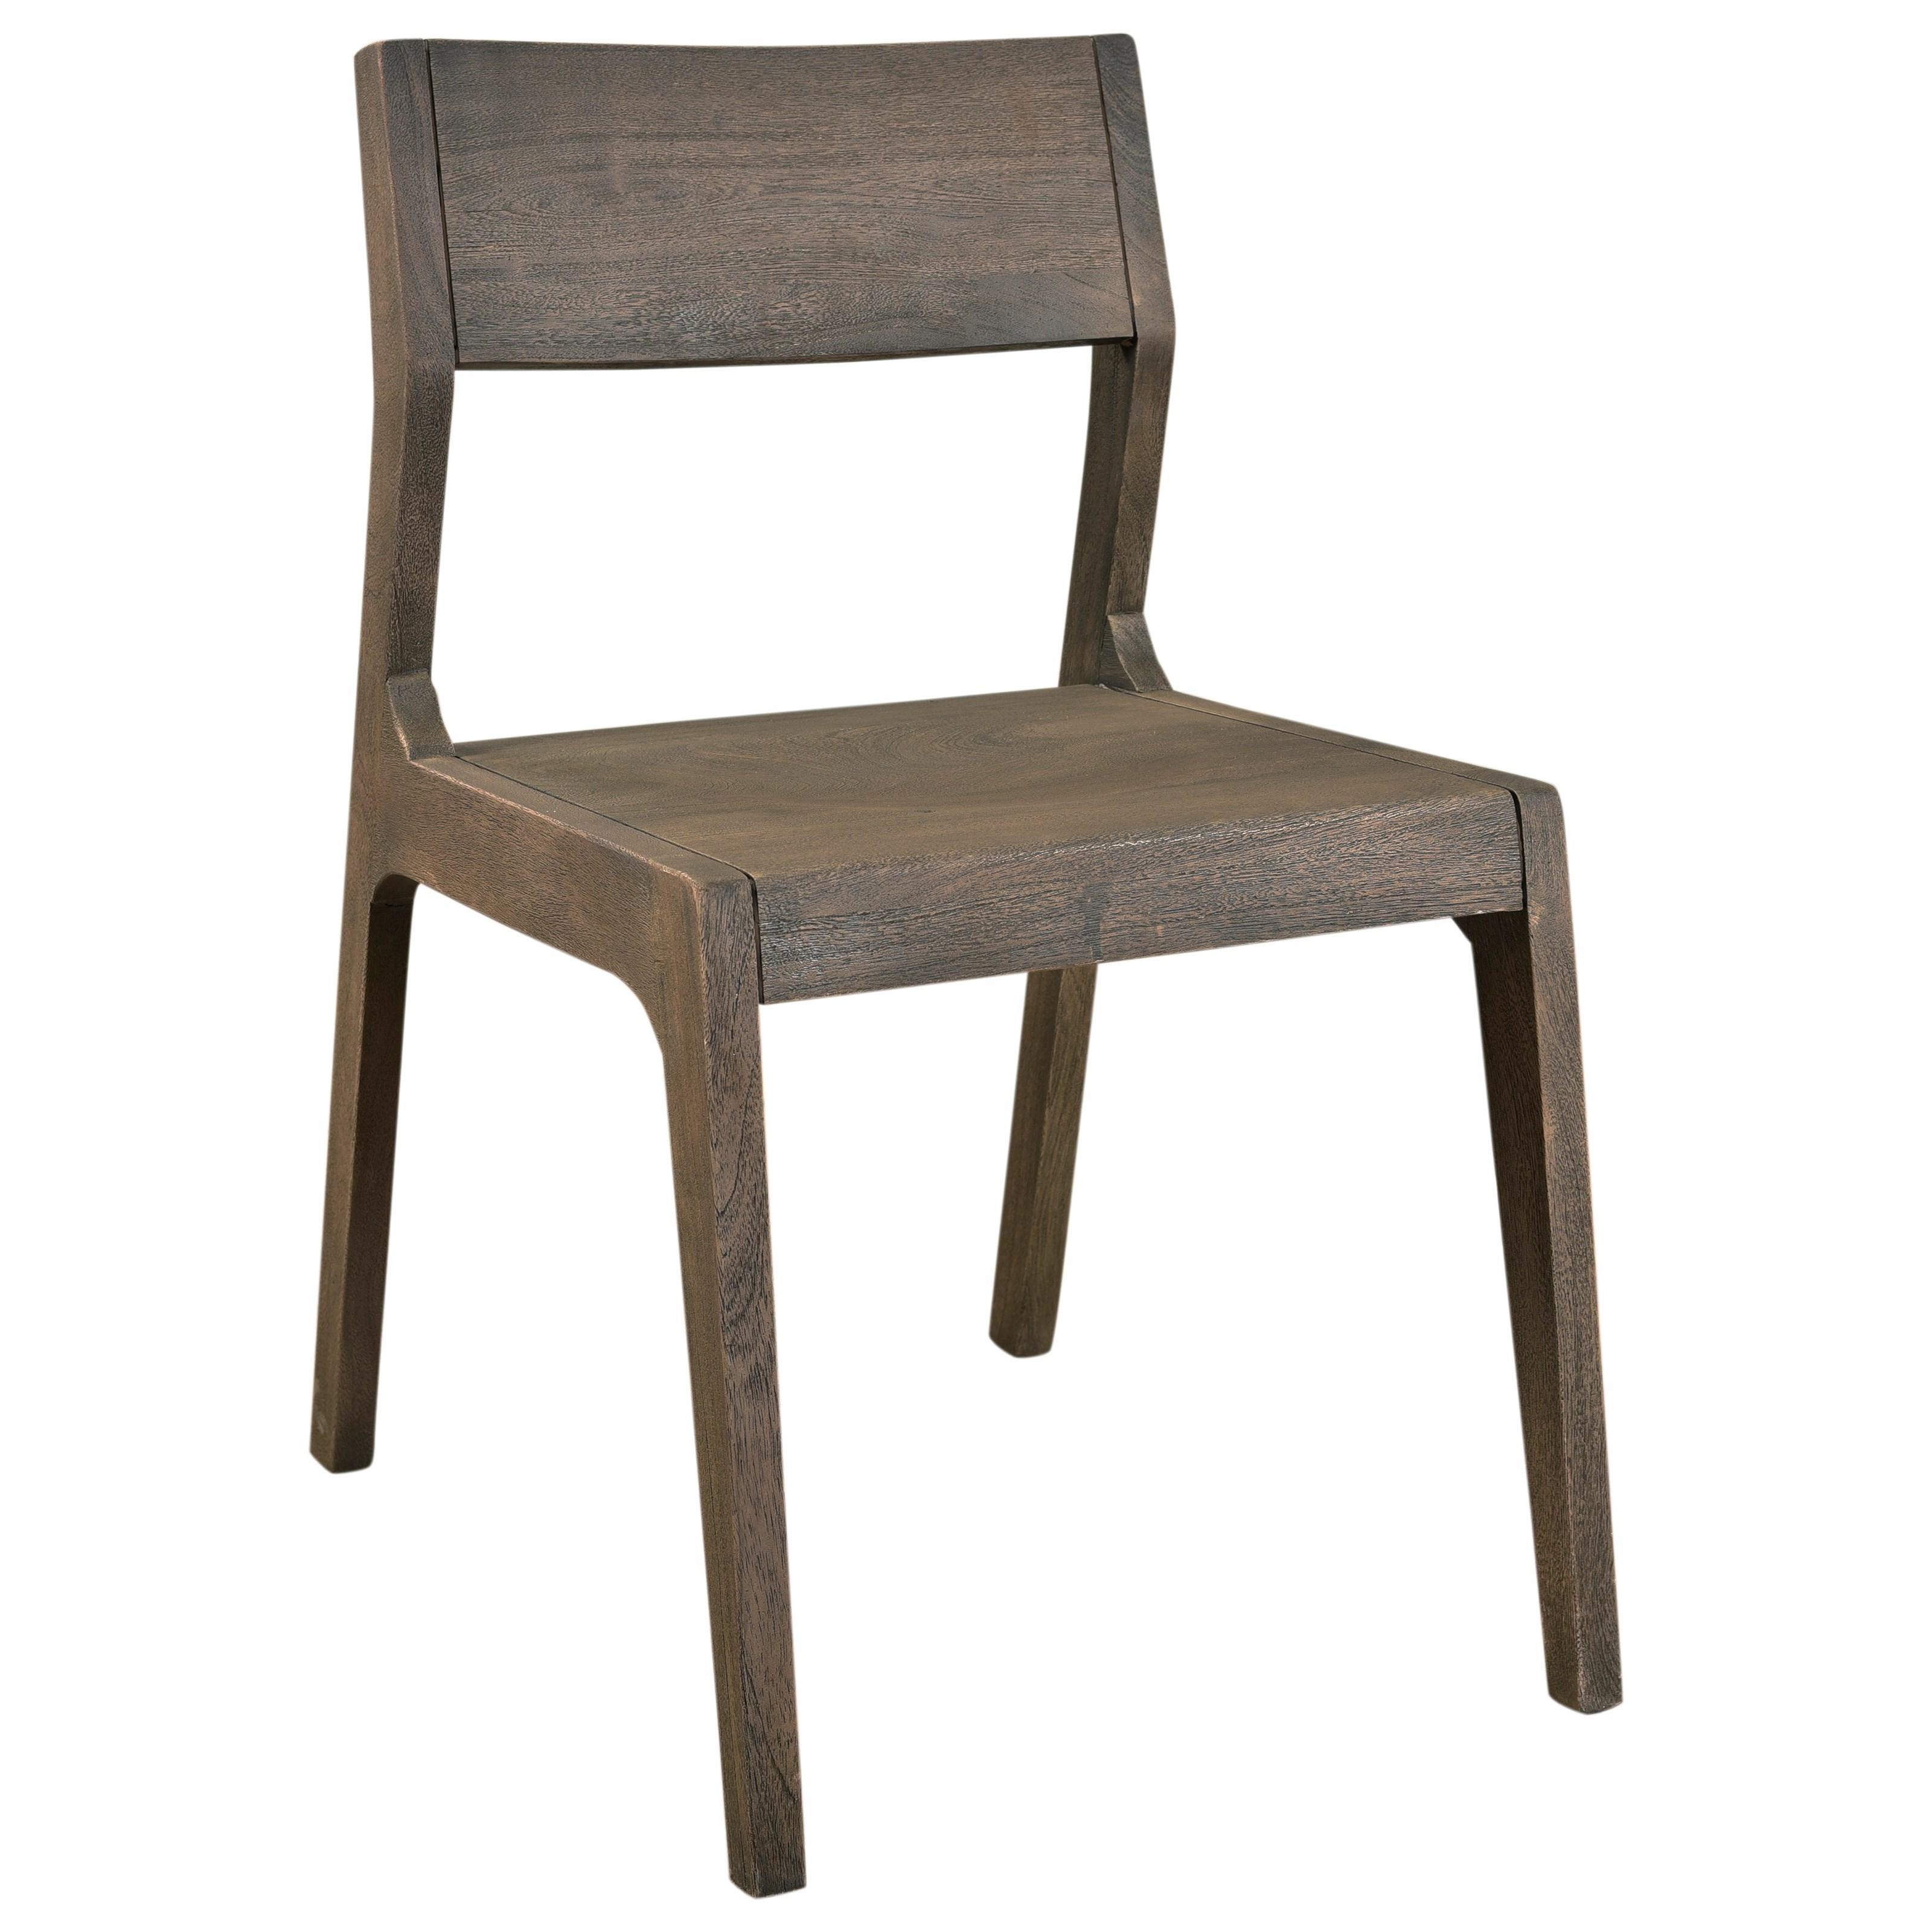 Coast To Coast Imports Tundra Wood Dining Chair